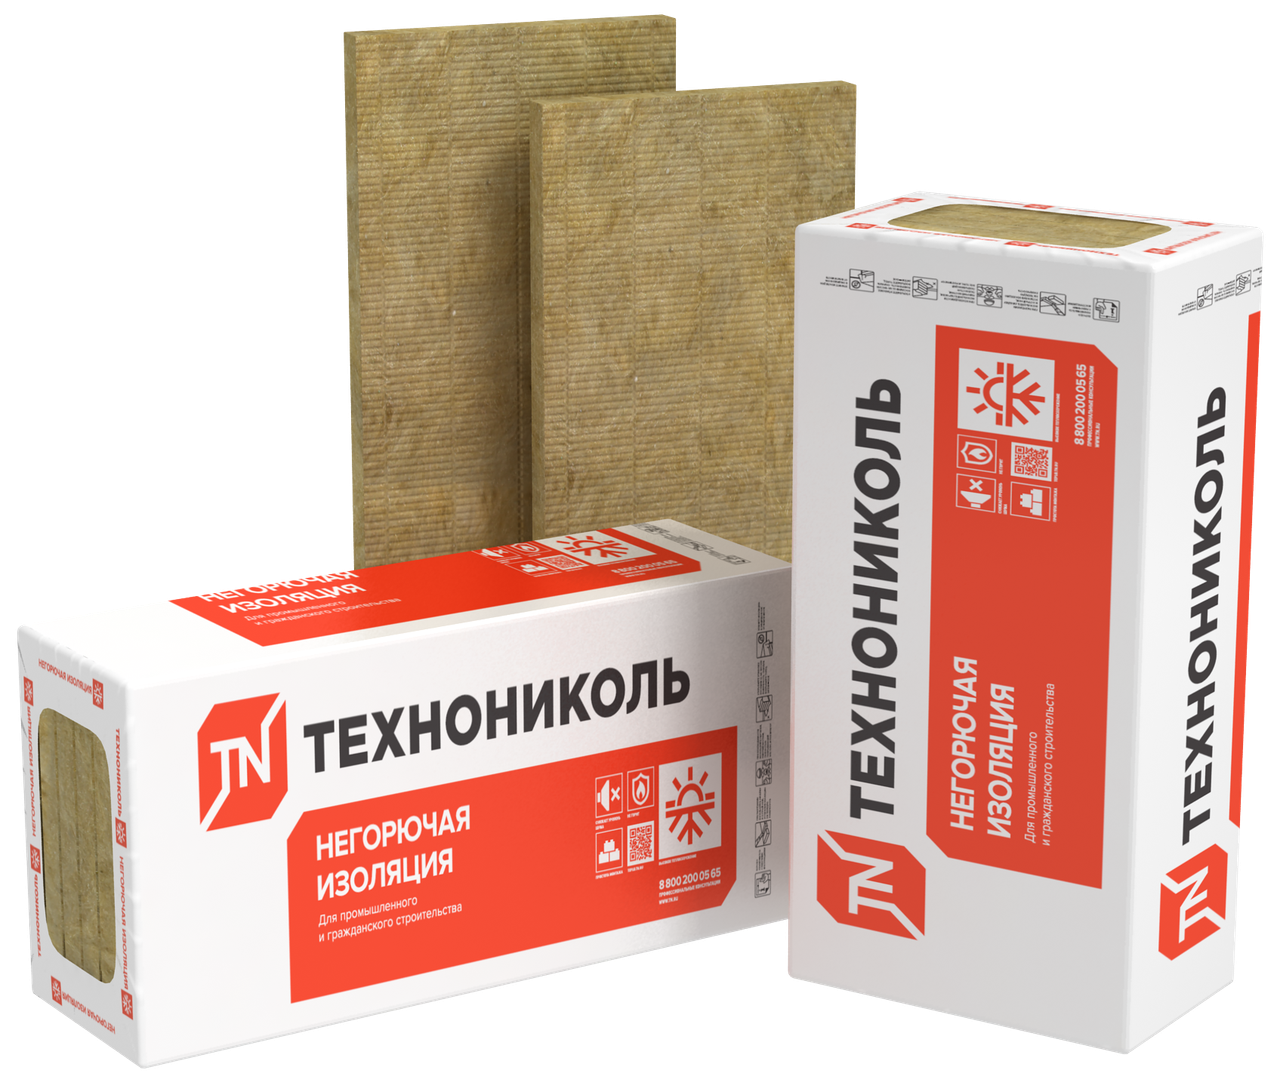 Вата мінеральна Sweetondale Техноруф Н Екстра, 100 кг/куб.м 140 мм